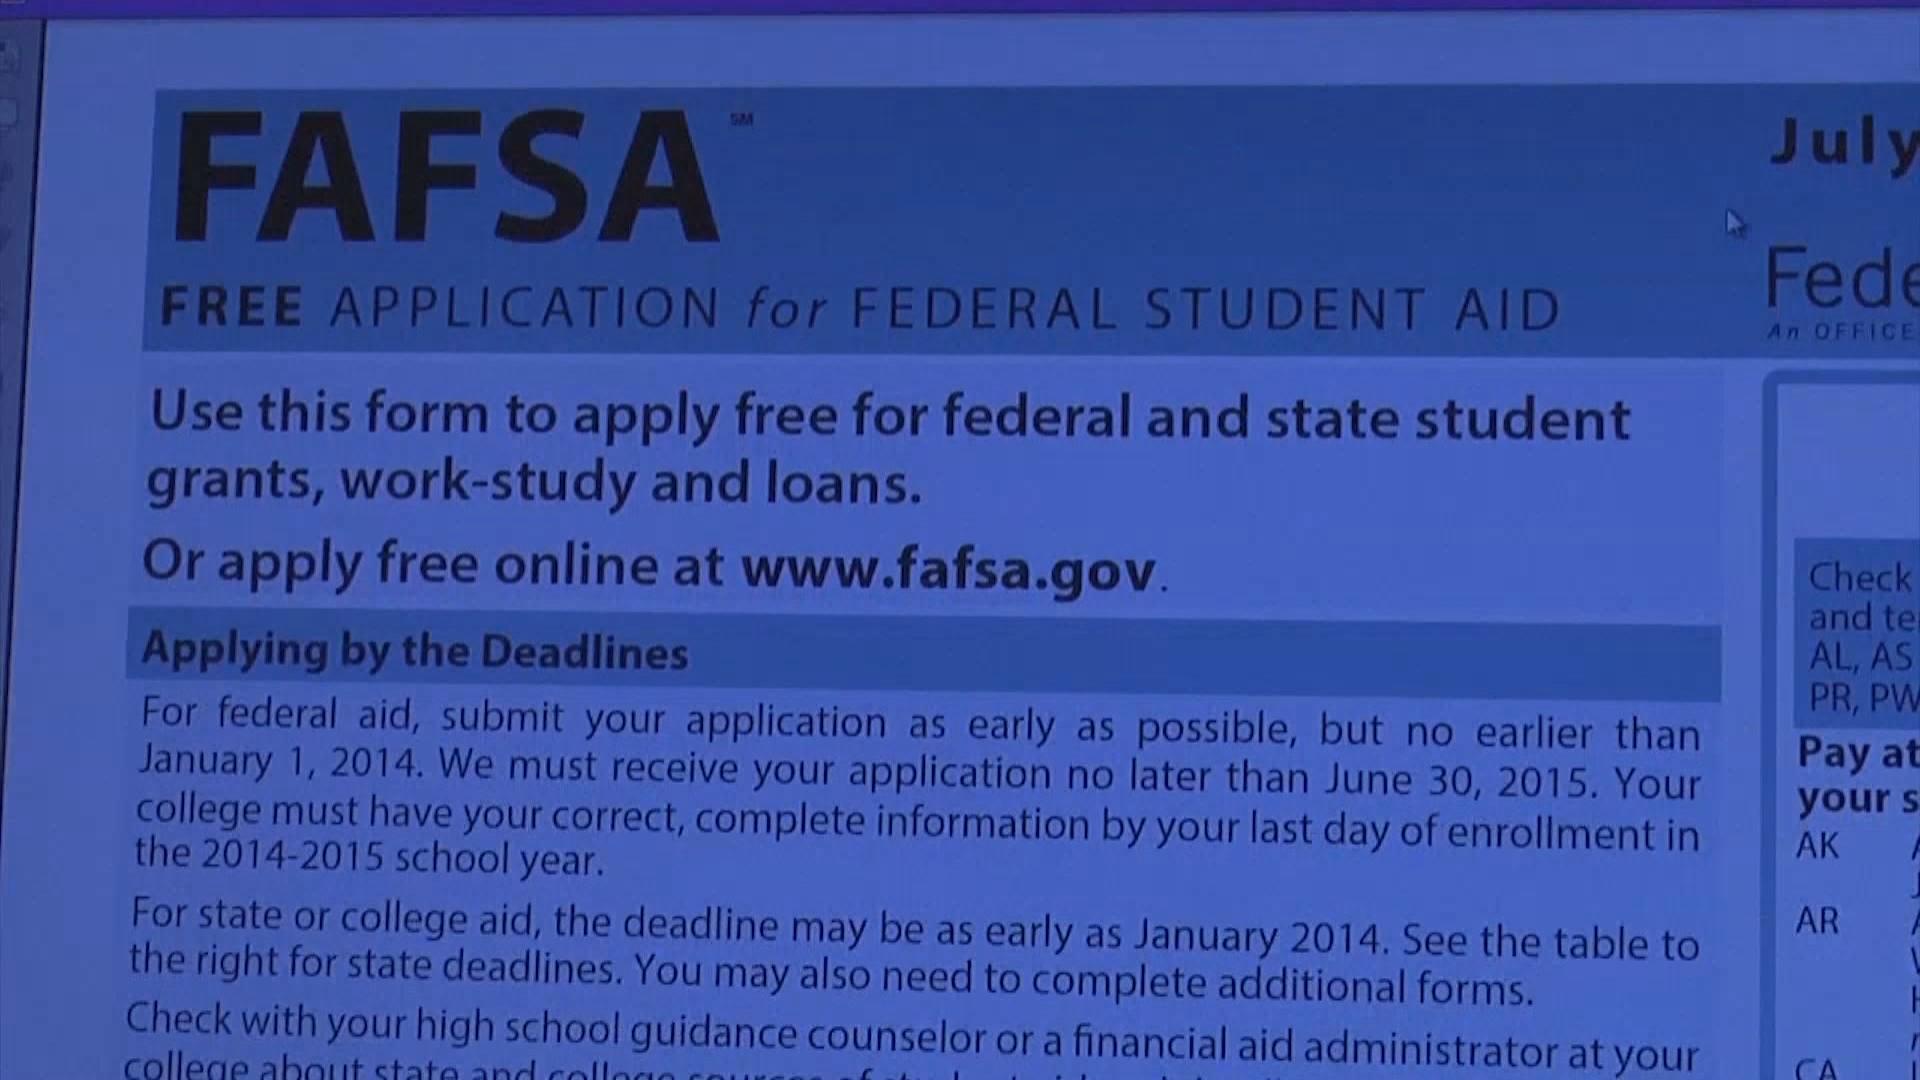 FAFSA BEGINS TODAY VO AM_frame_0_1538401644645.jpg.jpg